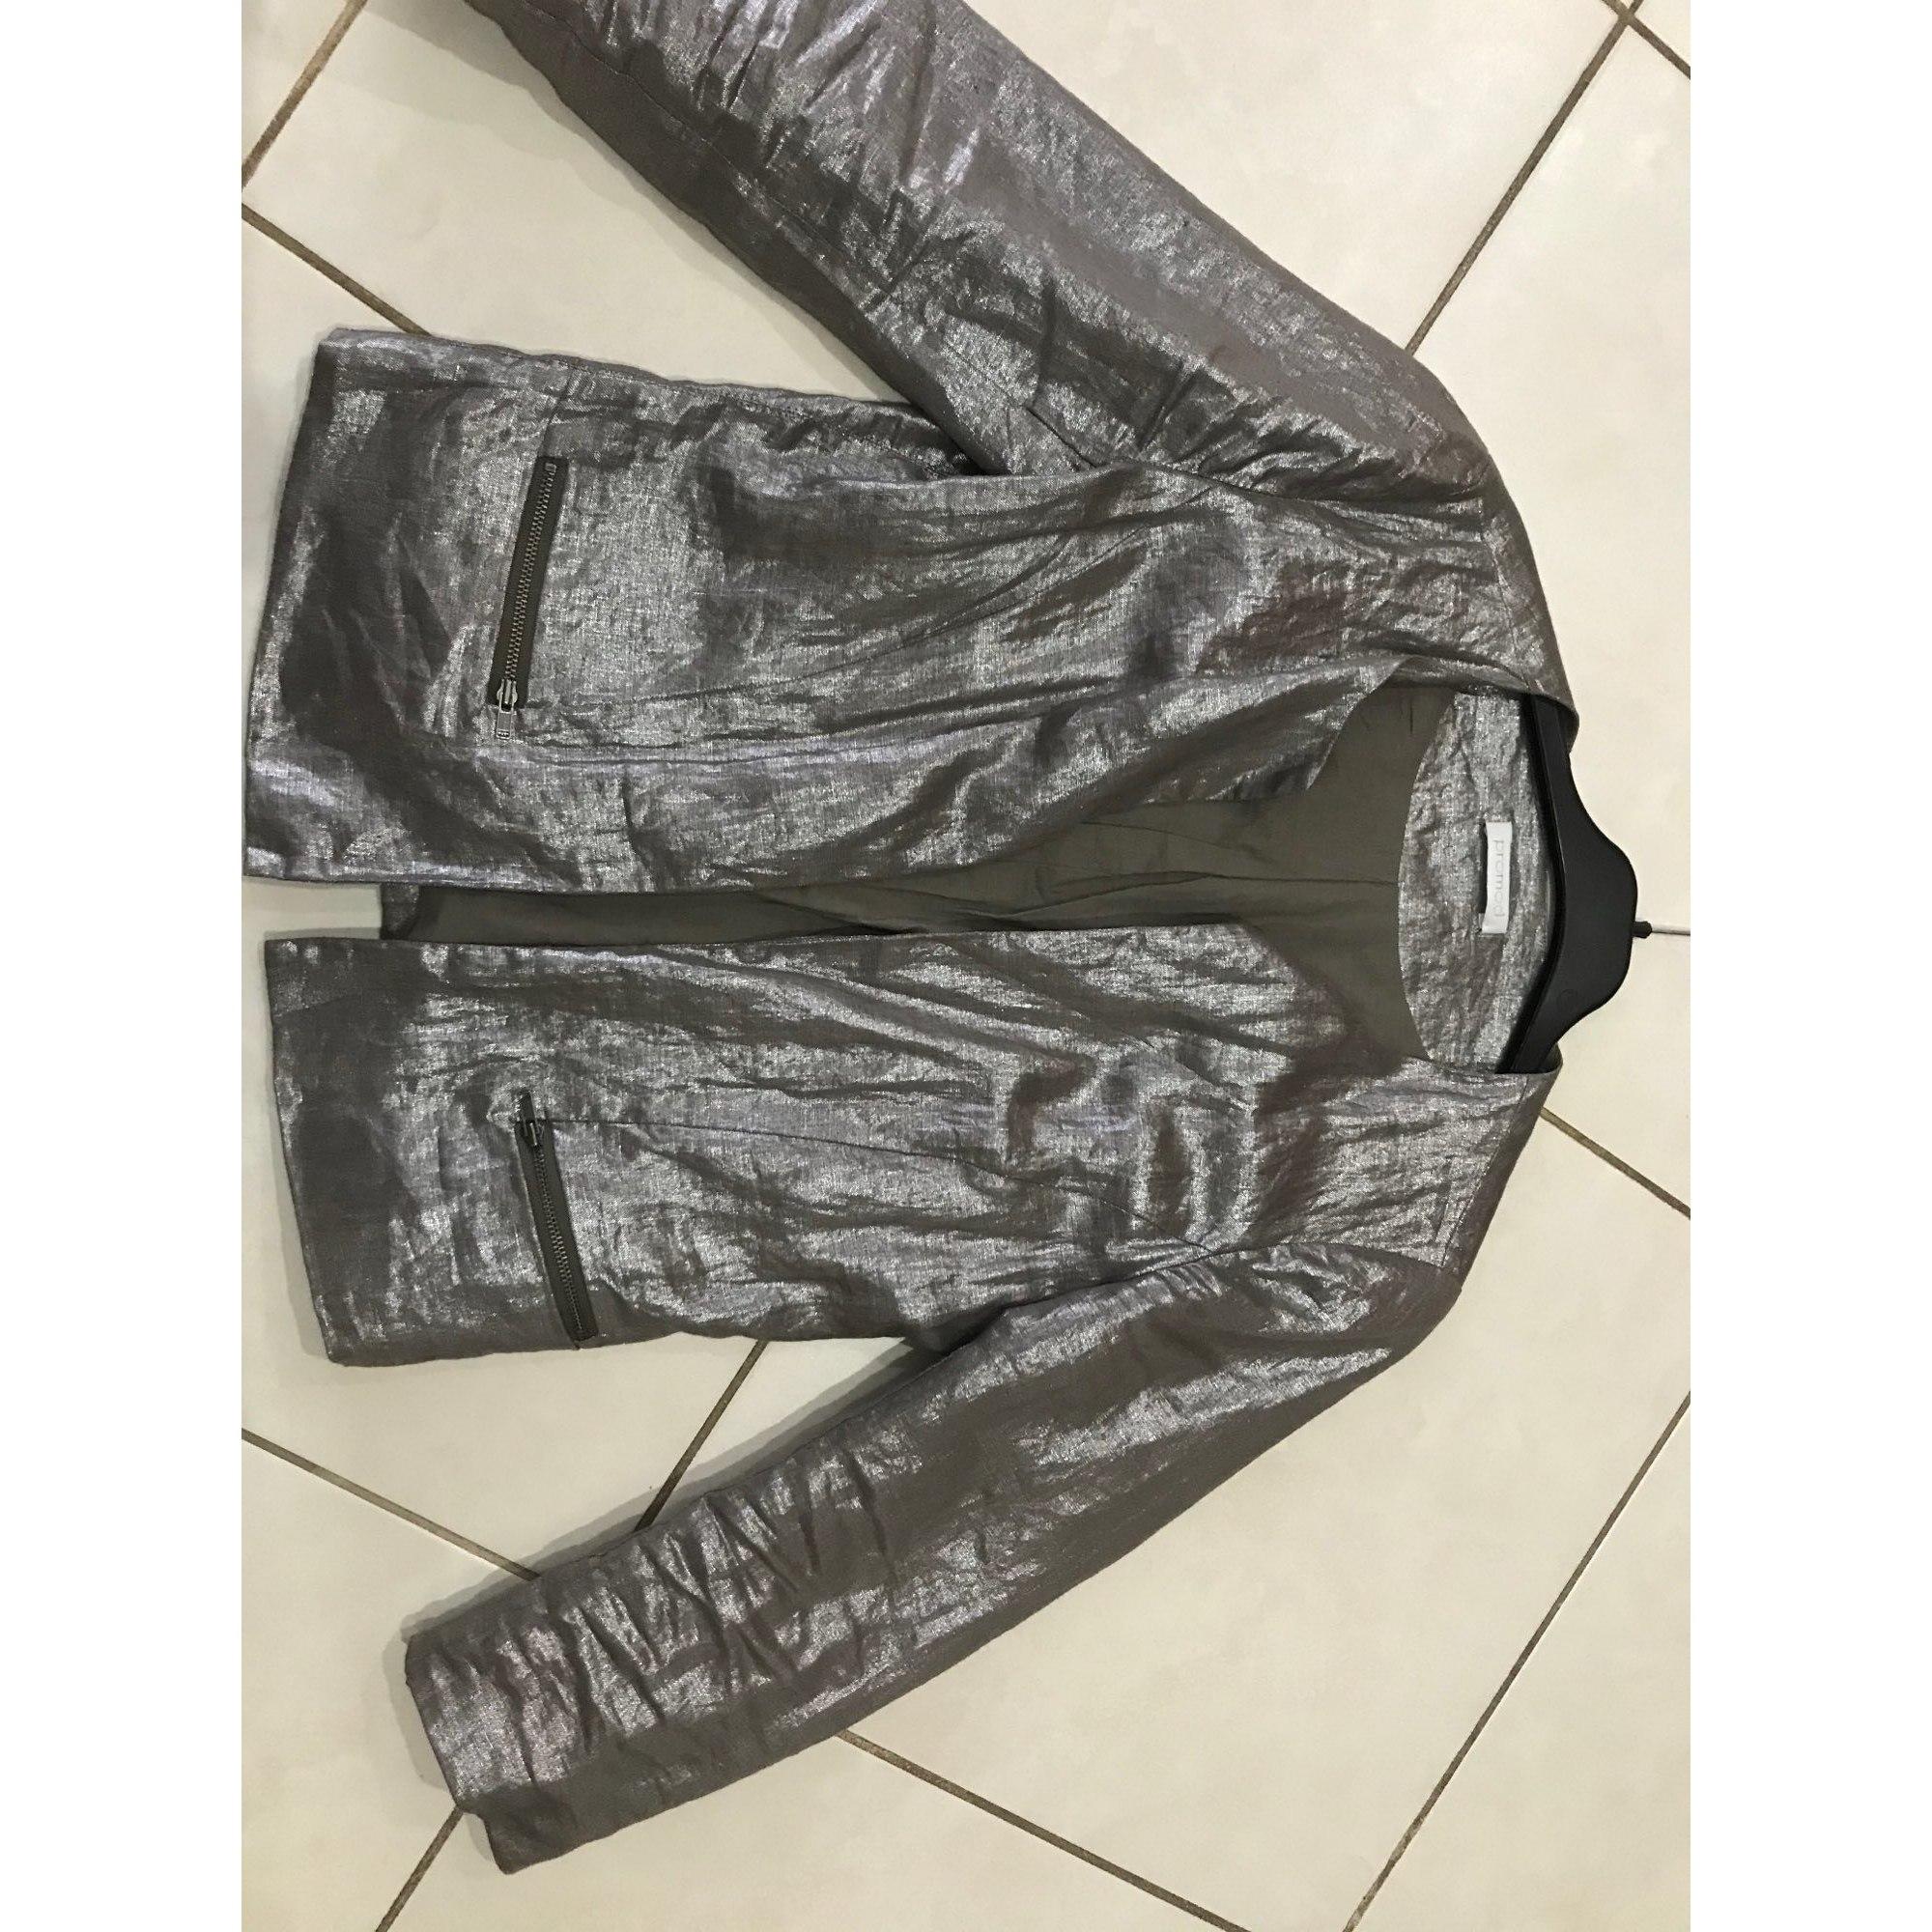 Blazer, veste tailleur PROMOD Doré, bronze, cuivre